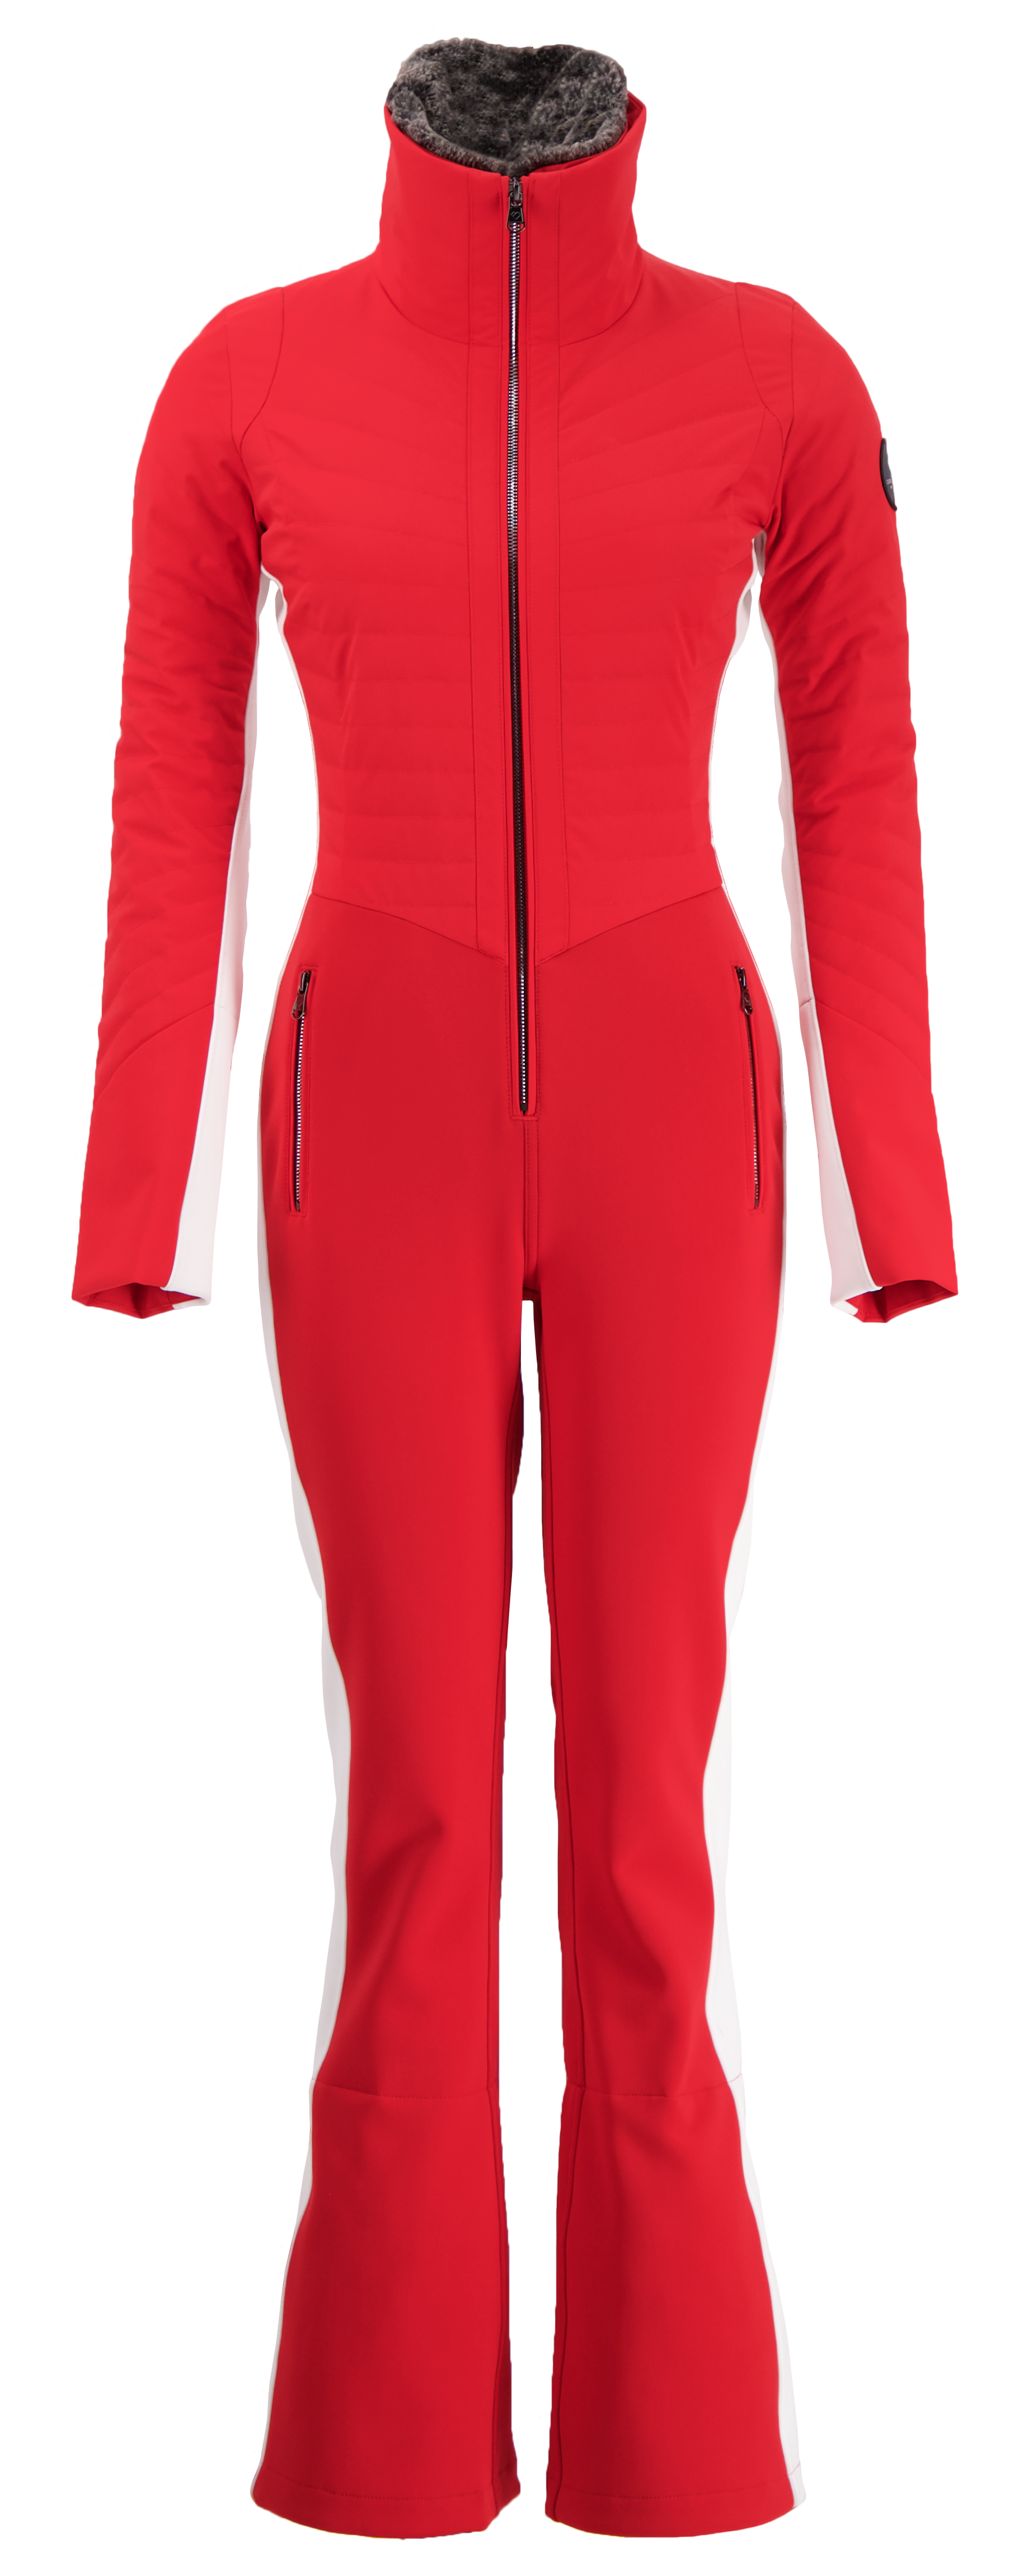 Nordica Olympia Sportmachine 14